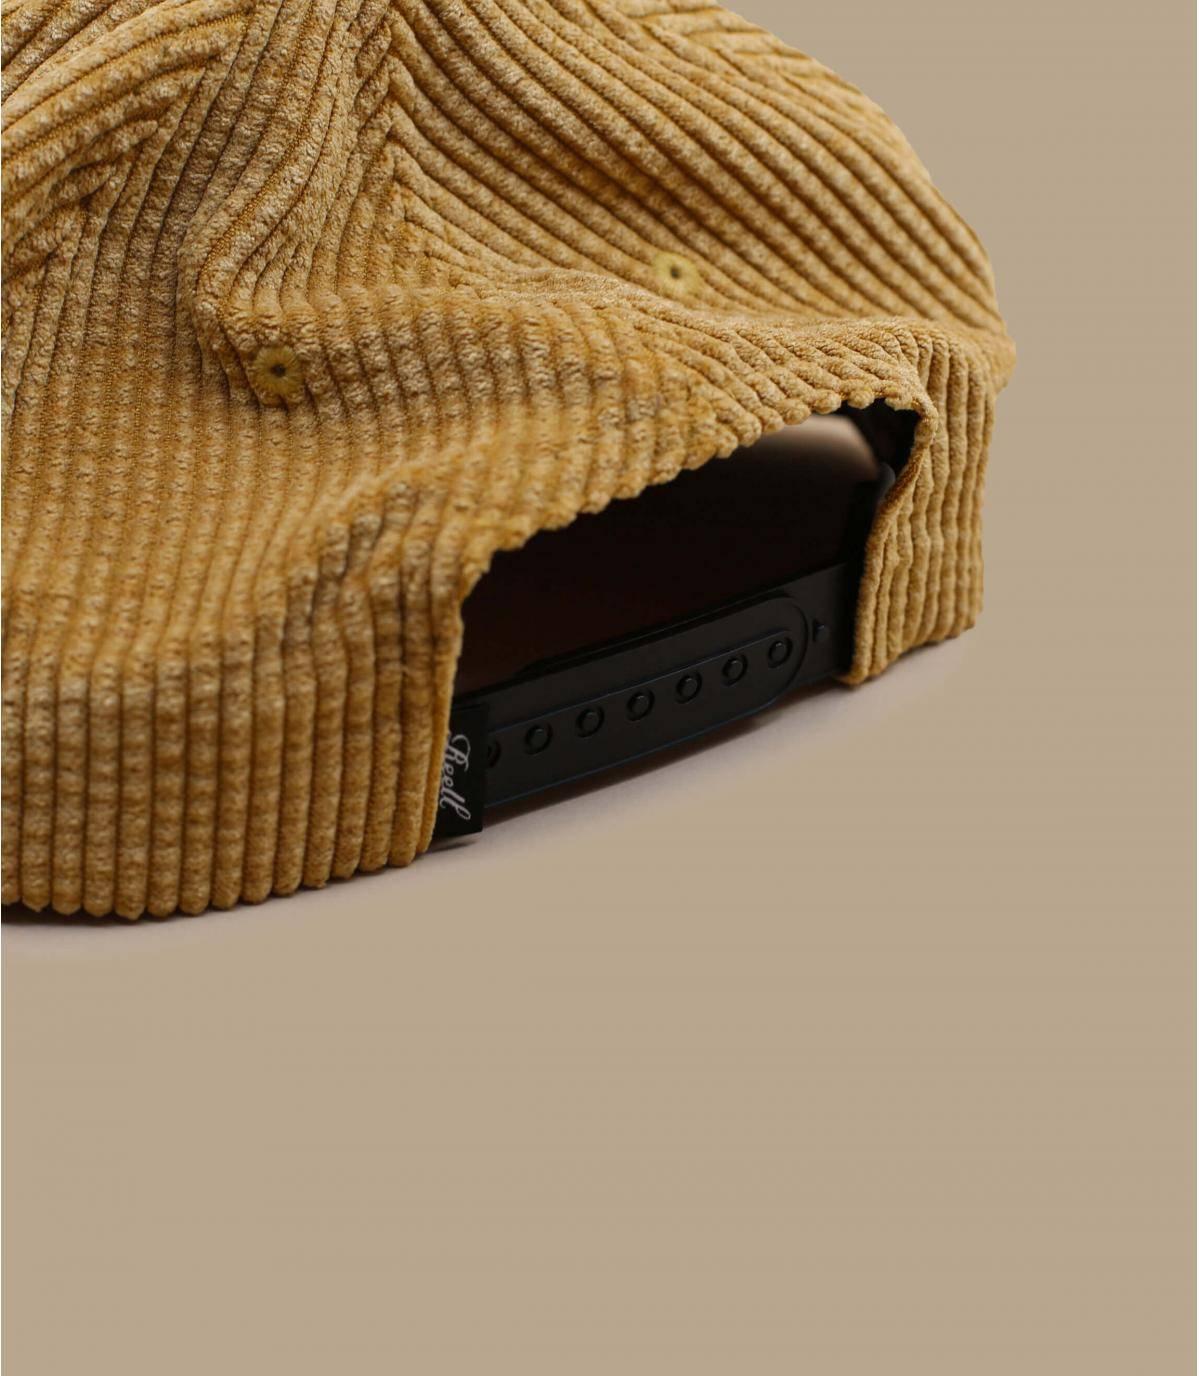 Dettagli Suede Cap Cord beige - image 4